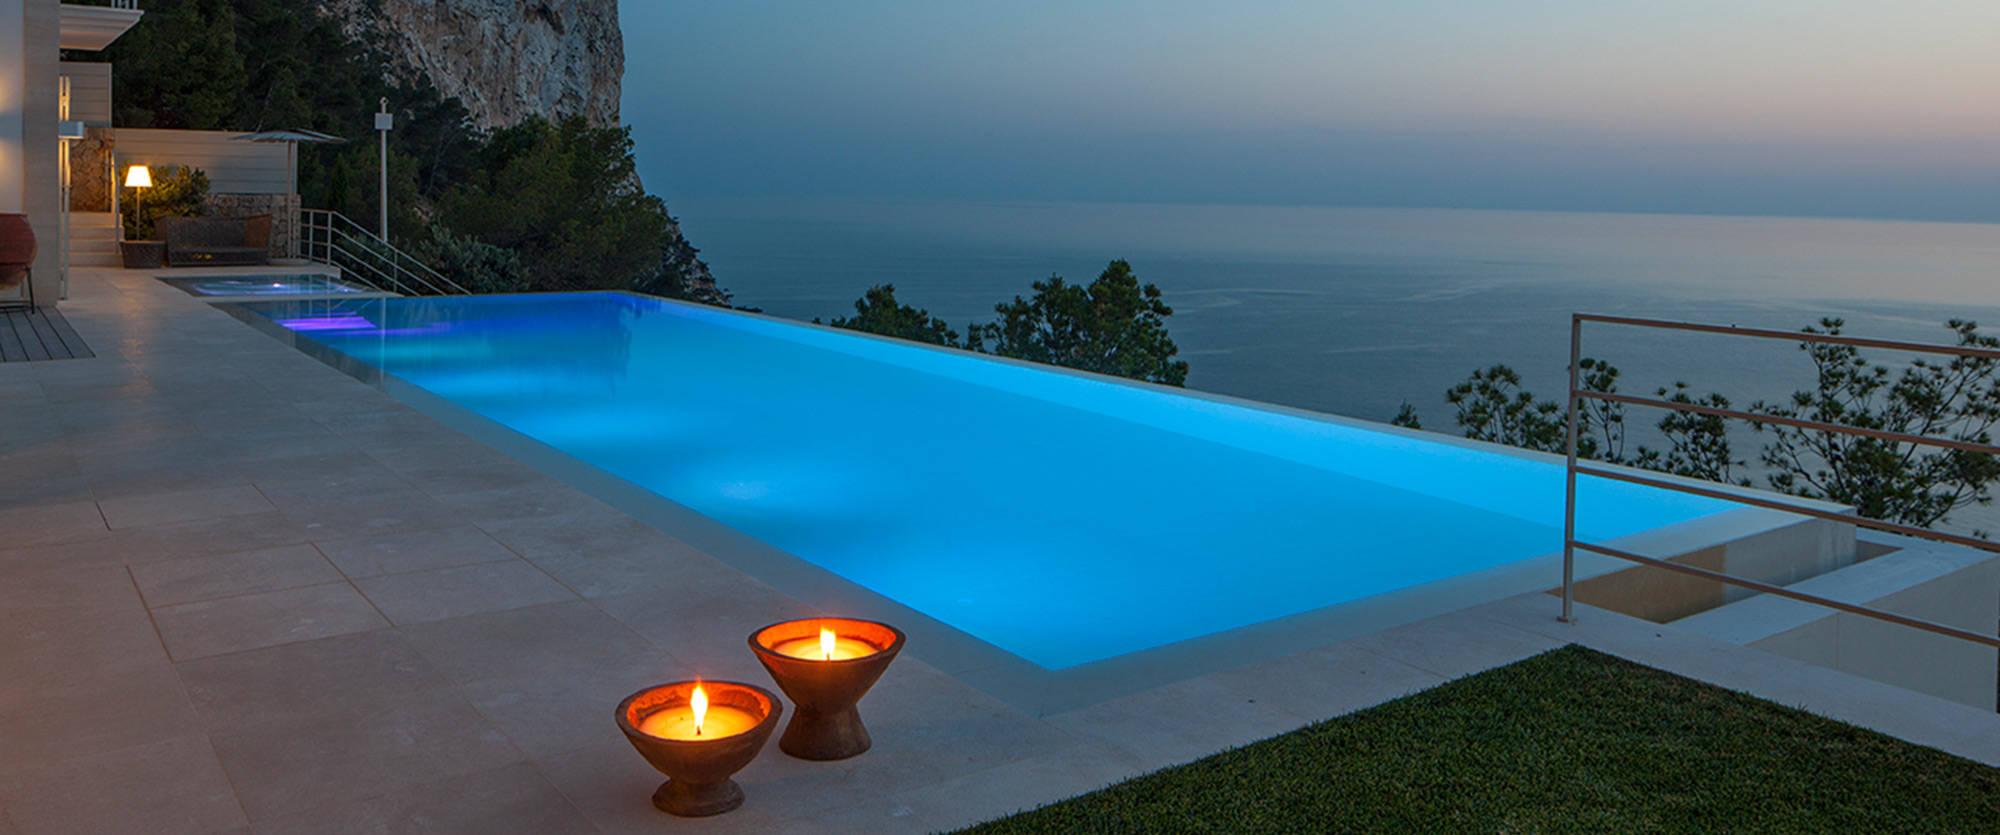 Luxus pool  Luxuspool mit endloser Weite